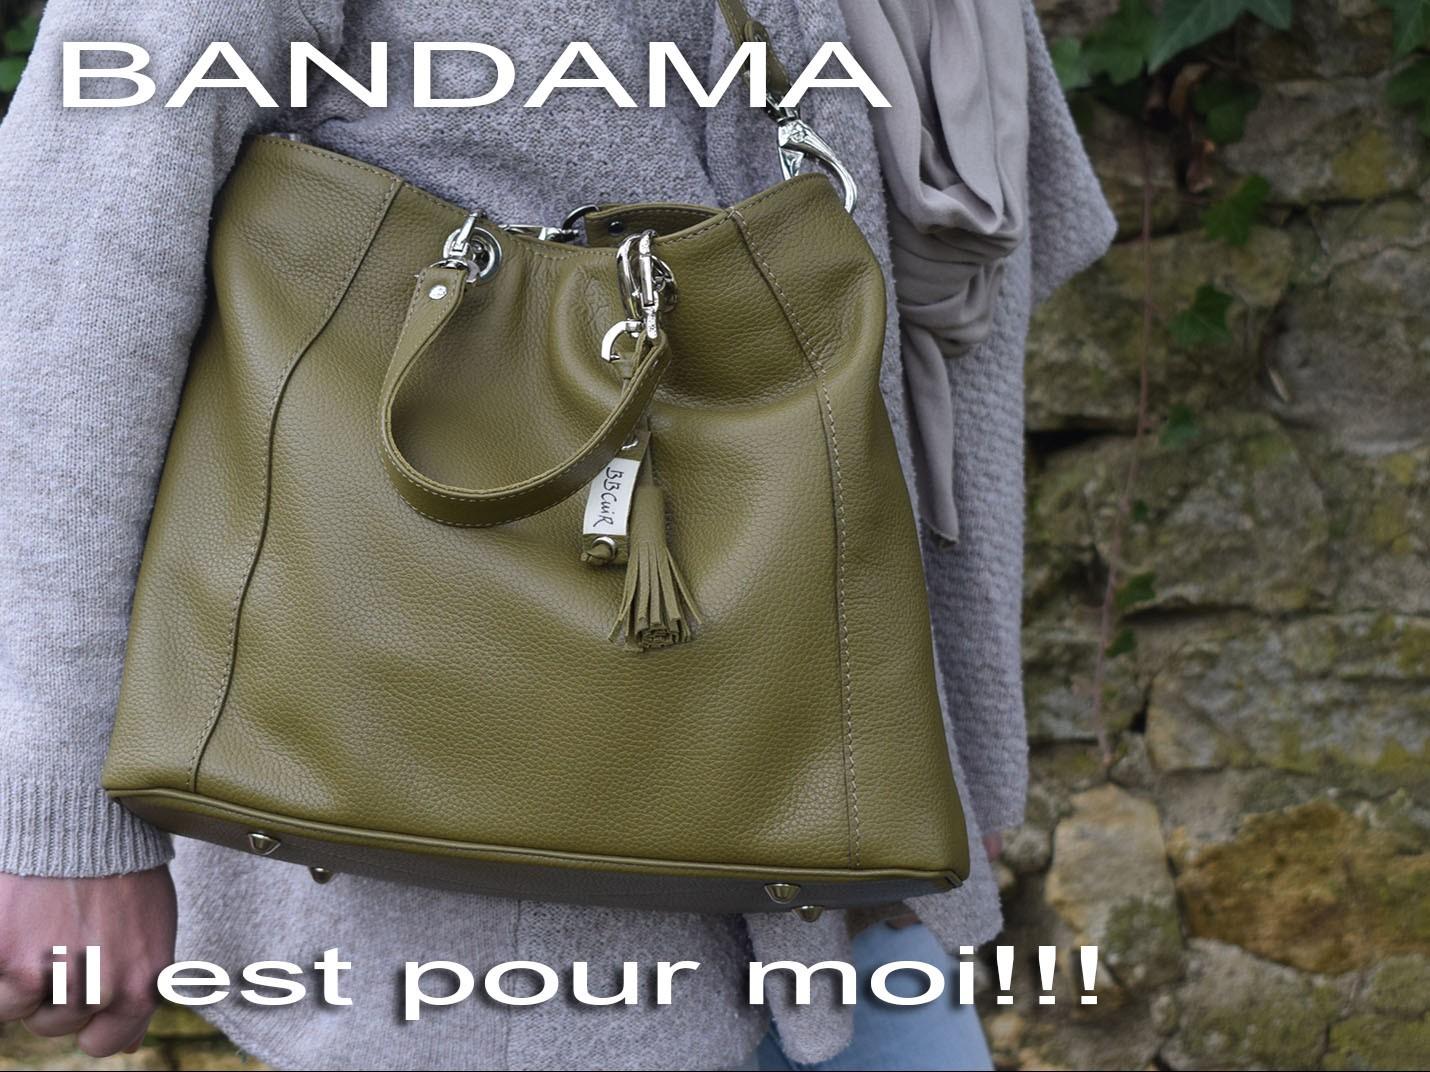 BB CUIR, sac en cuir de fabrication artisanale française, maroquinerie de  luxe - BBCUIR c0c94df202b